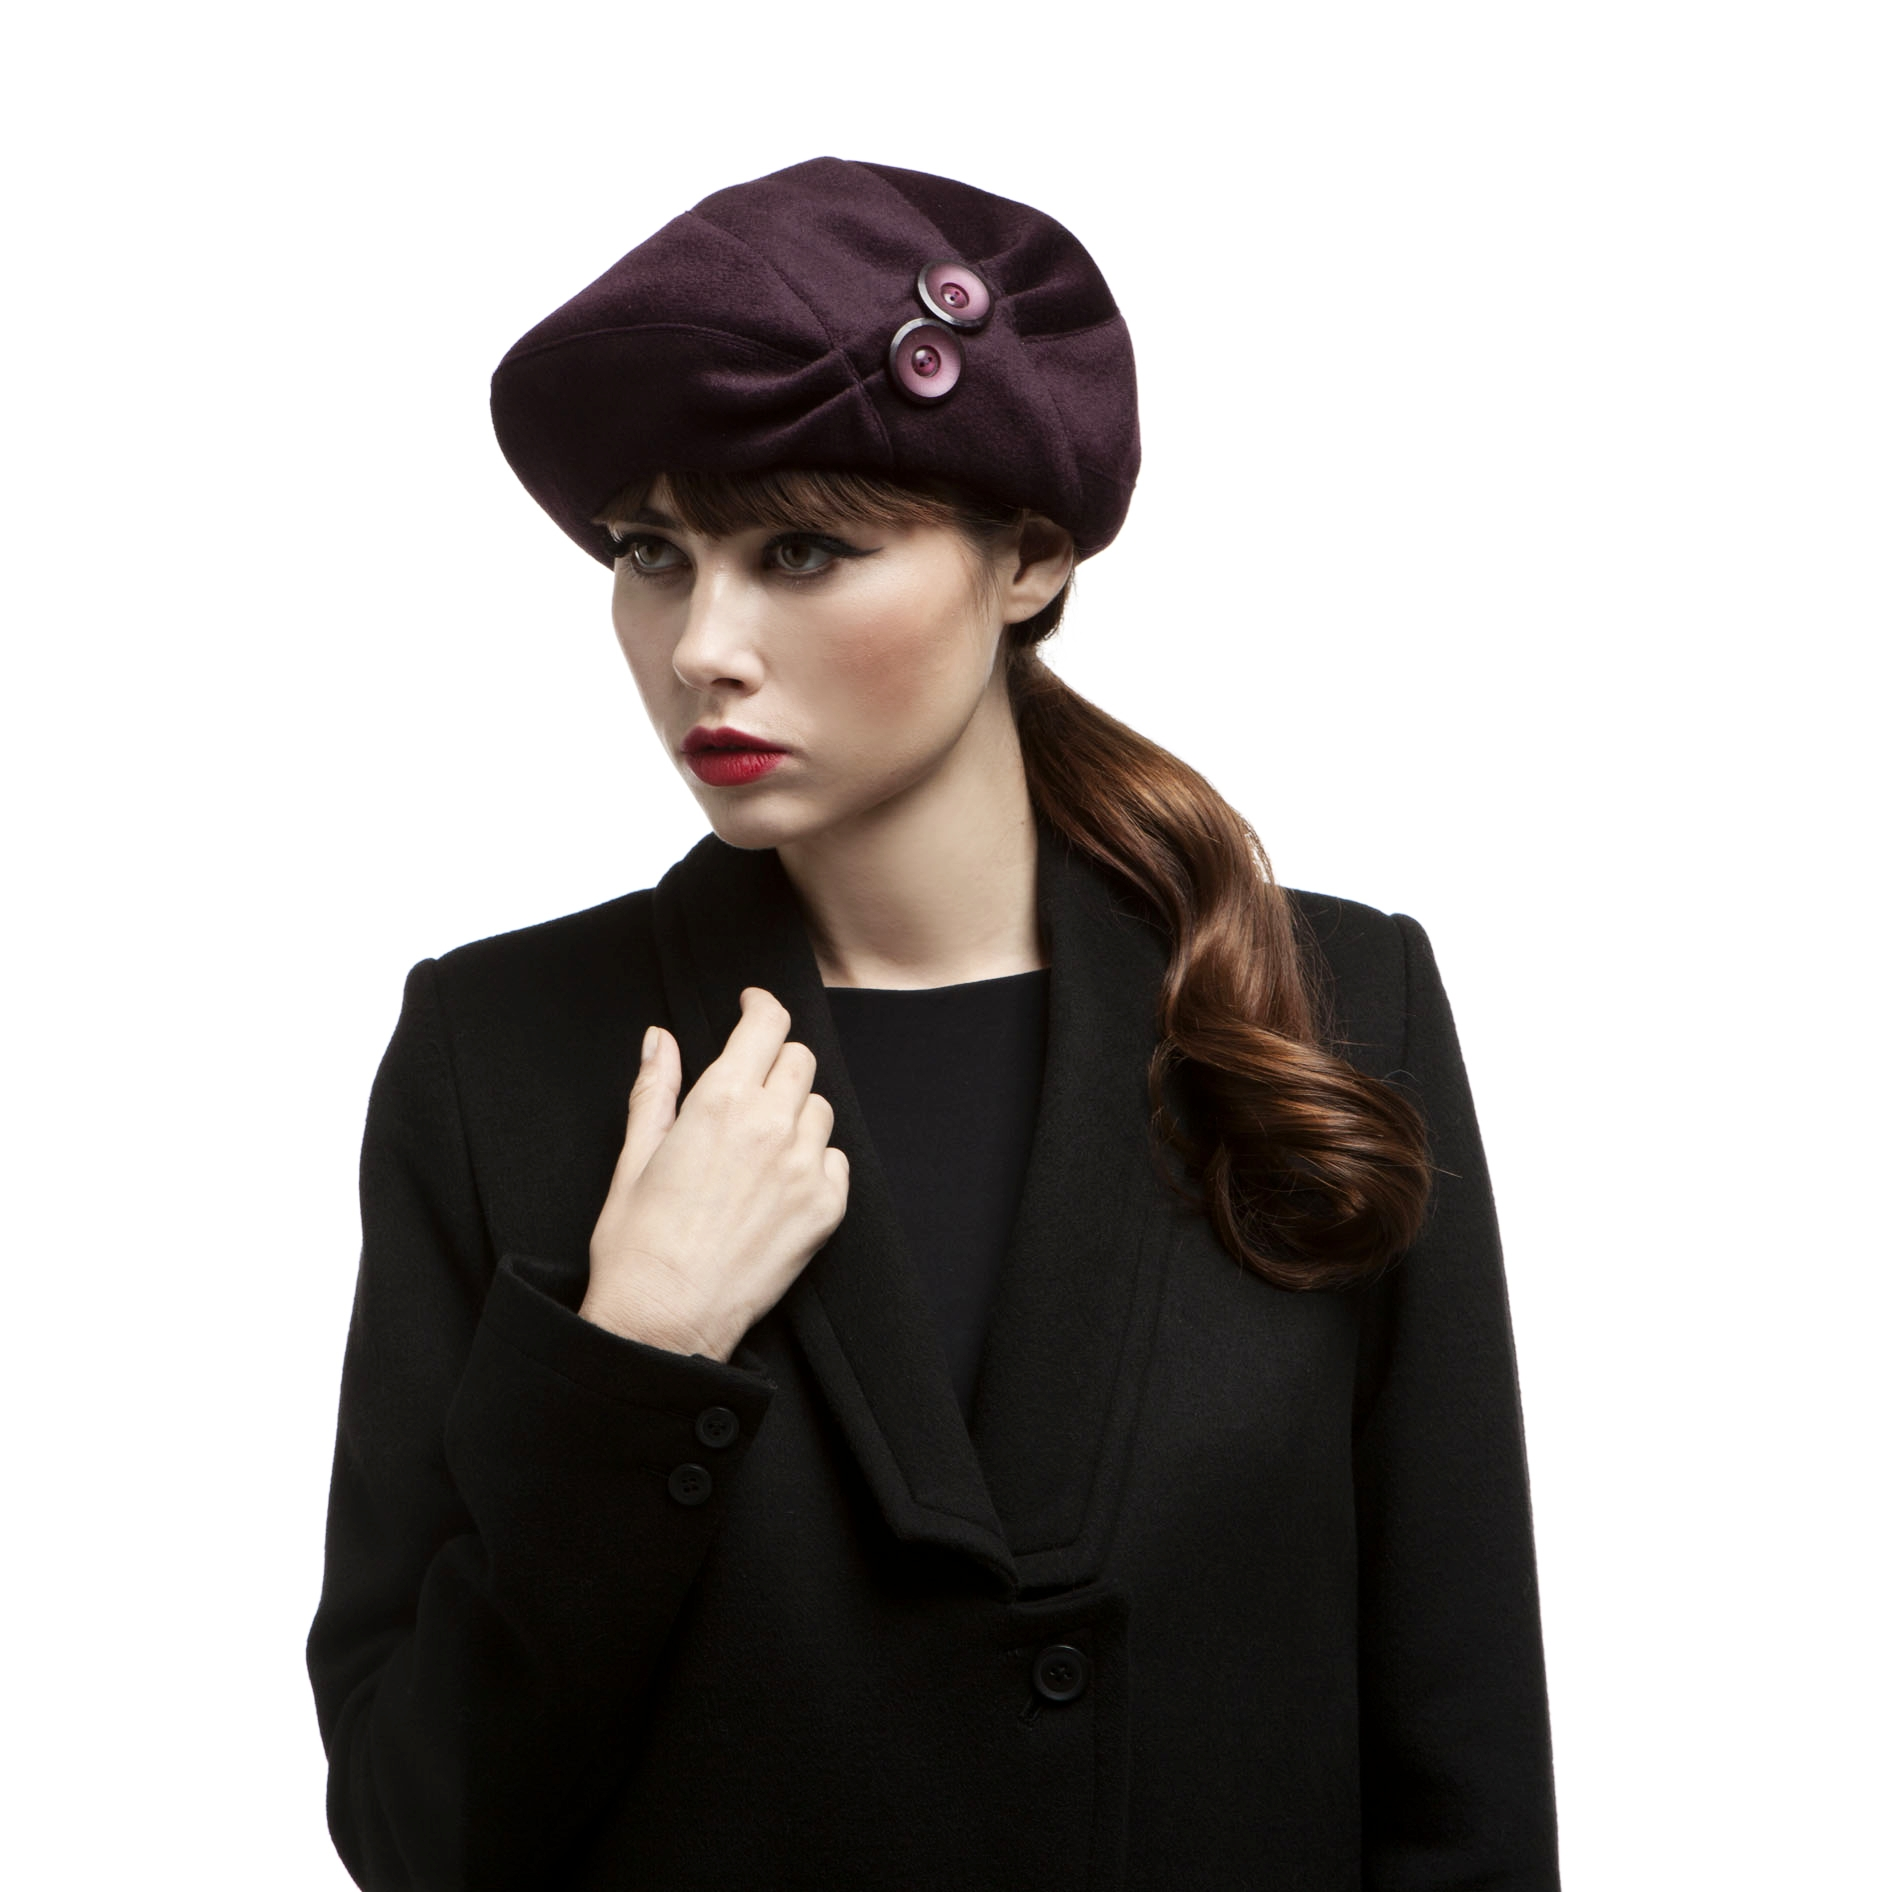 'Bonnie' beret in aubergine wool/cashmere